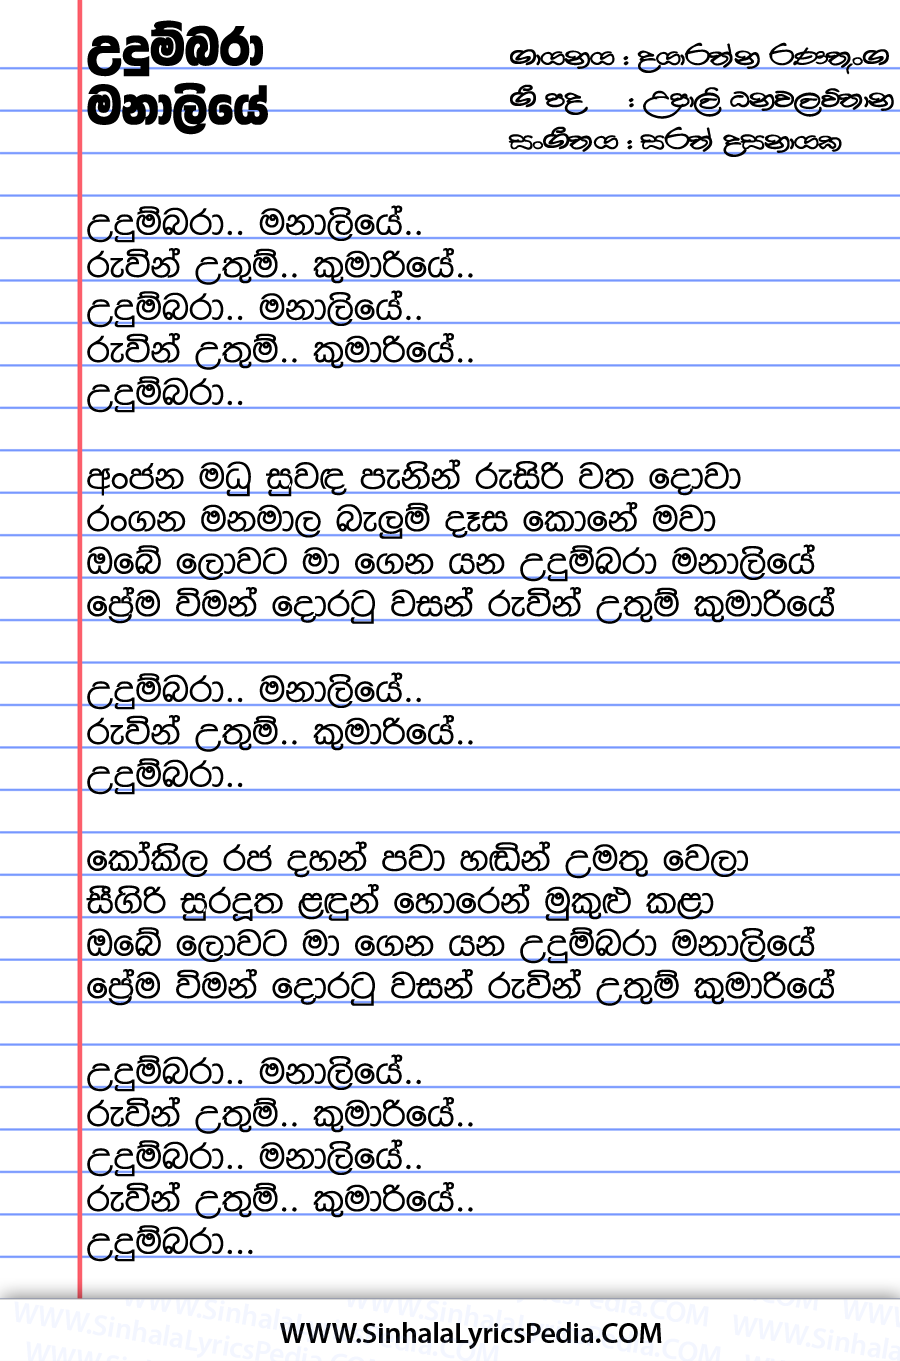 Udumbara Manaliye Song Lyrics